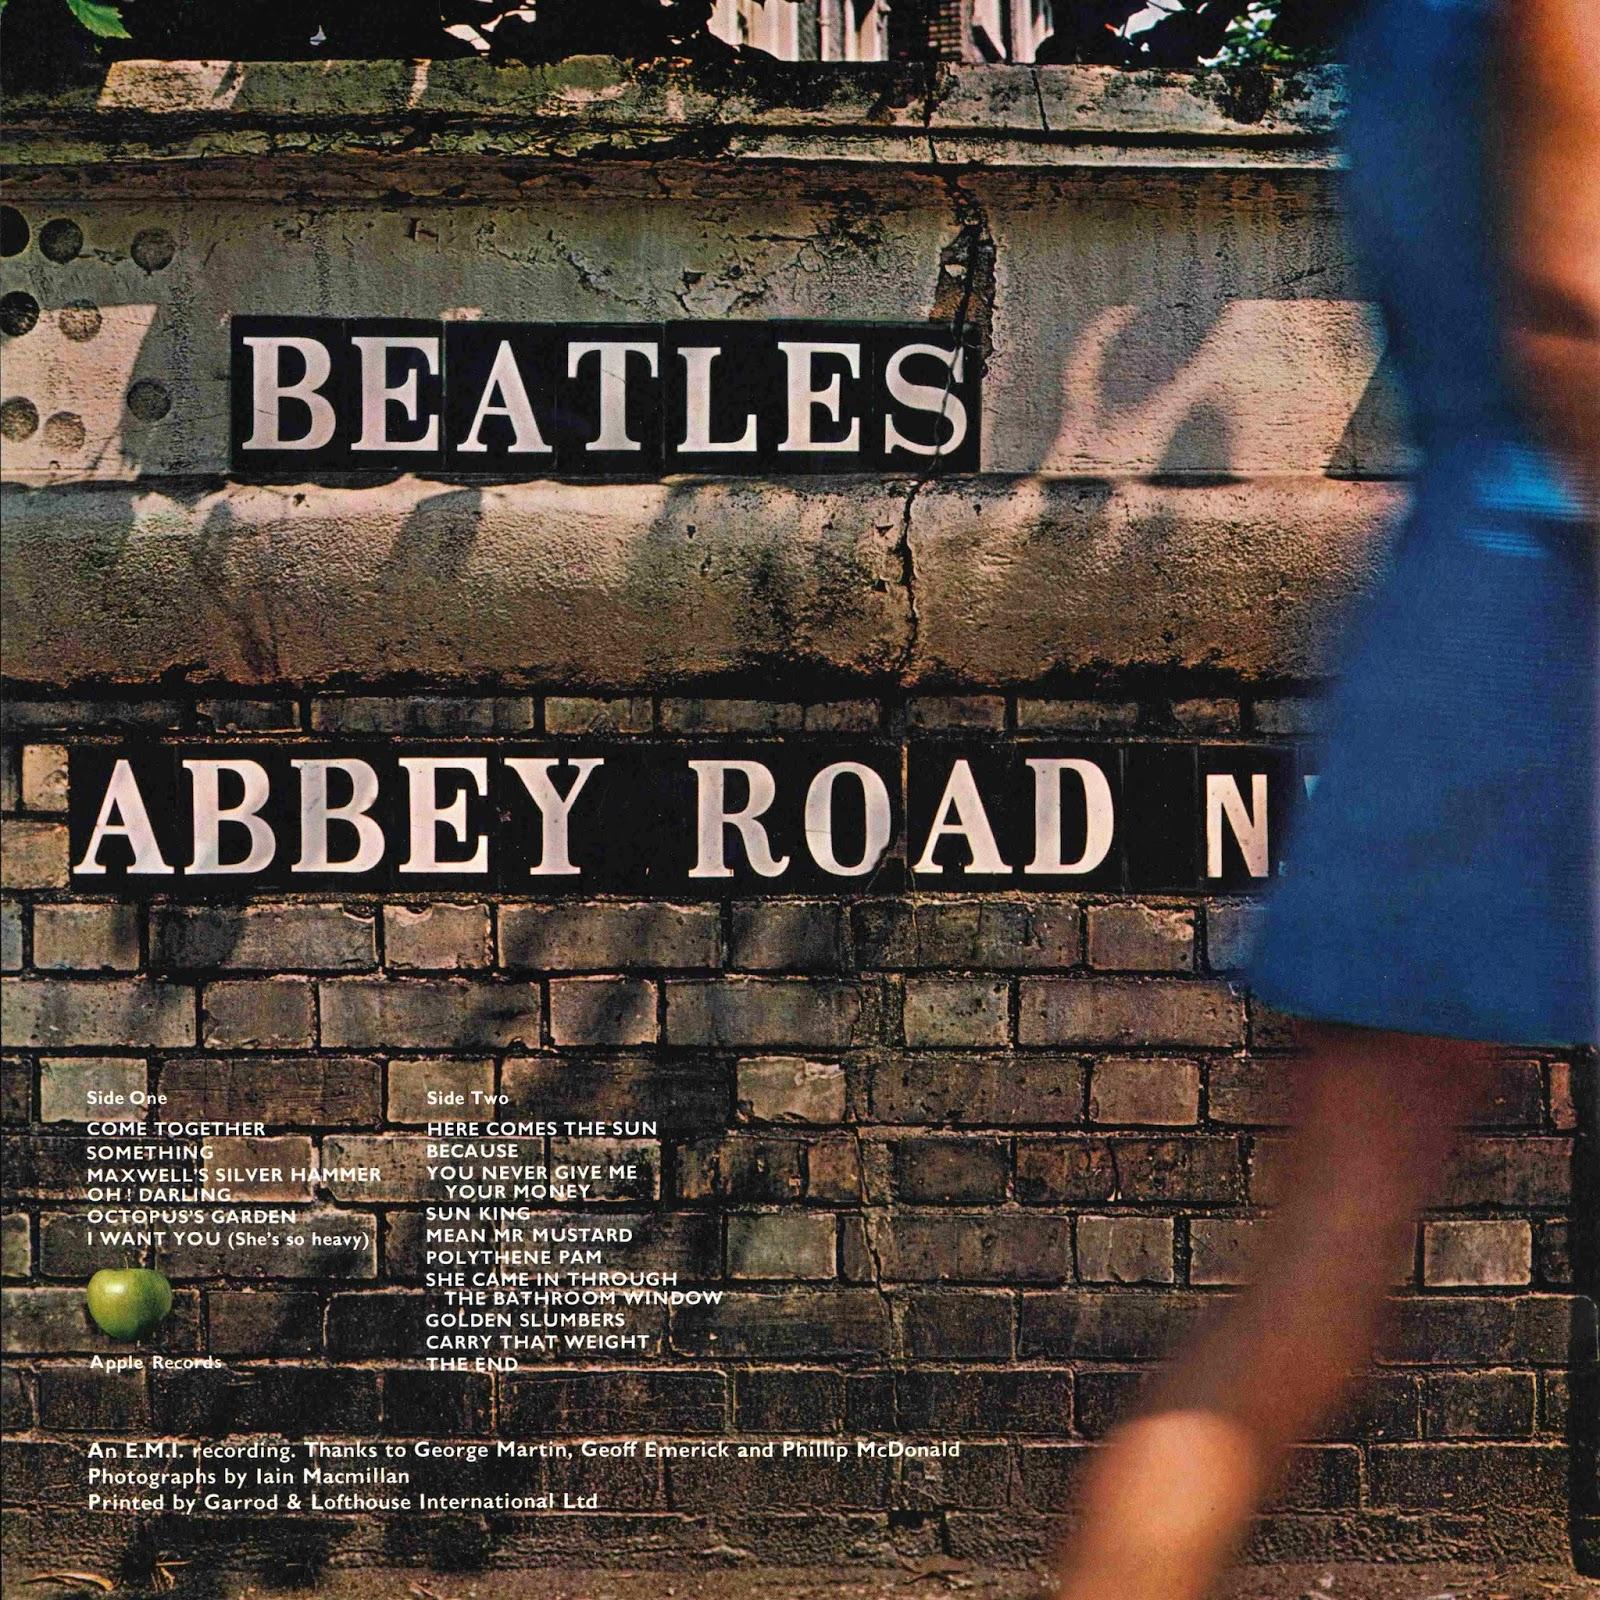 File:AbbeyRoadBackCover.jpg